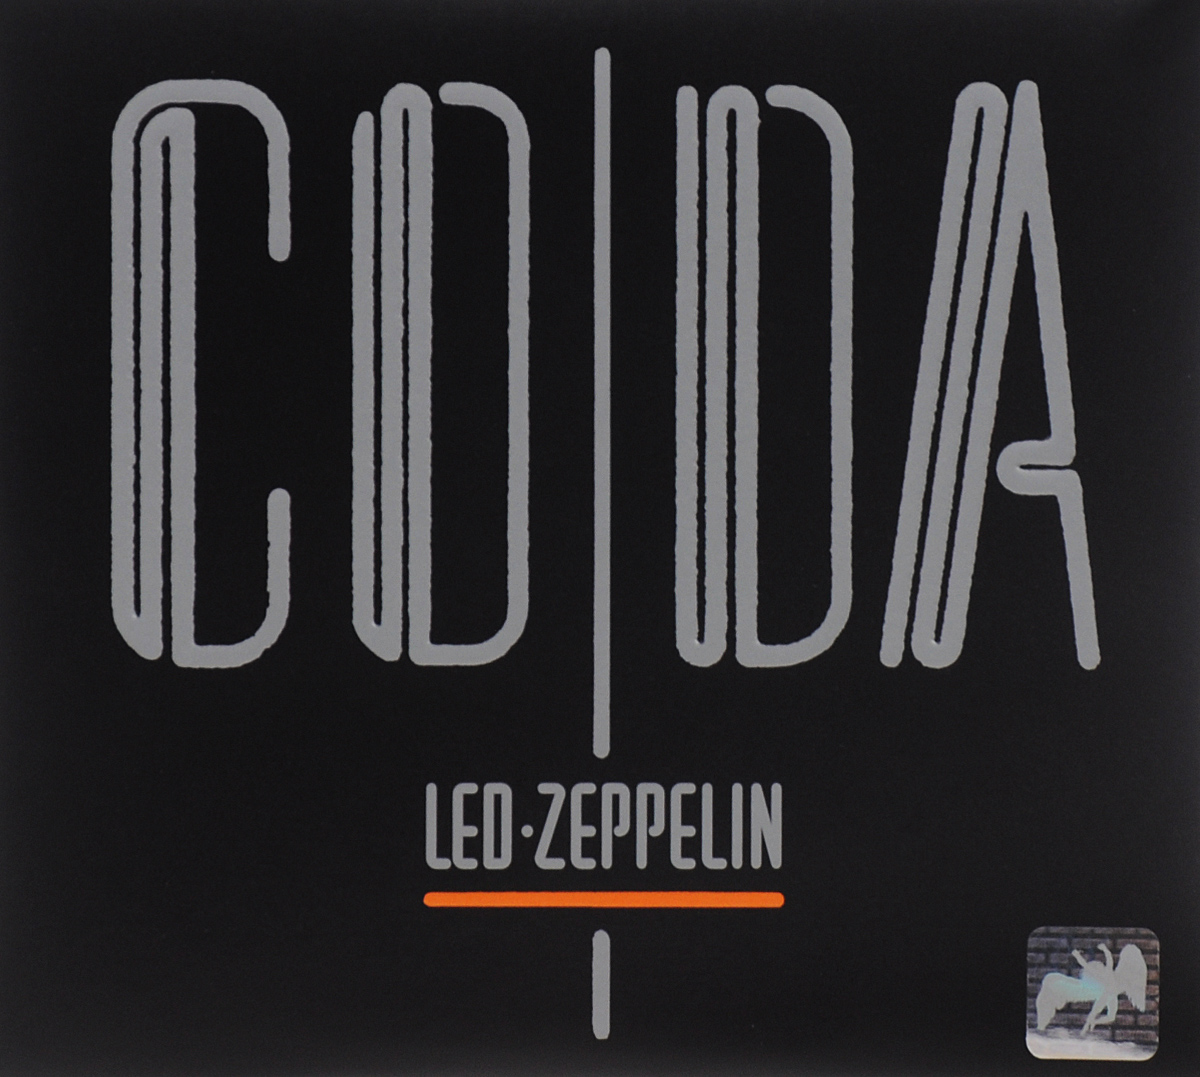 Led Zeppelin.  Coda.  Deluxe Edition (3 CD) Warner Music,Atlantic Recording Corporation